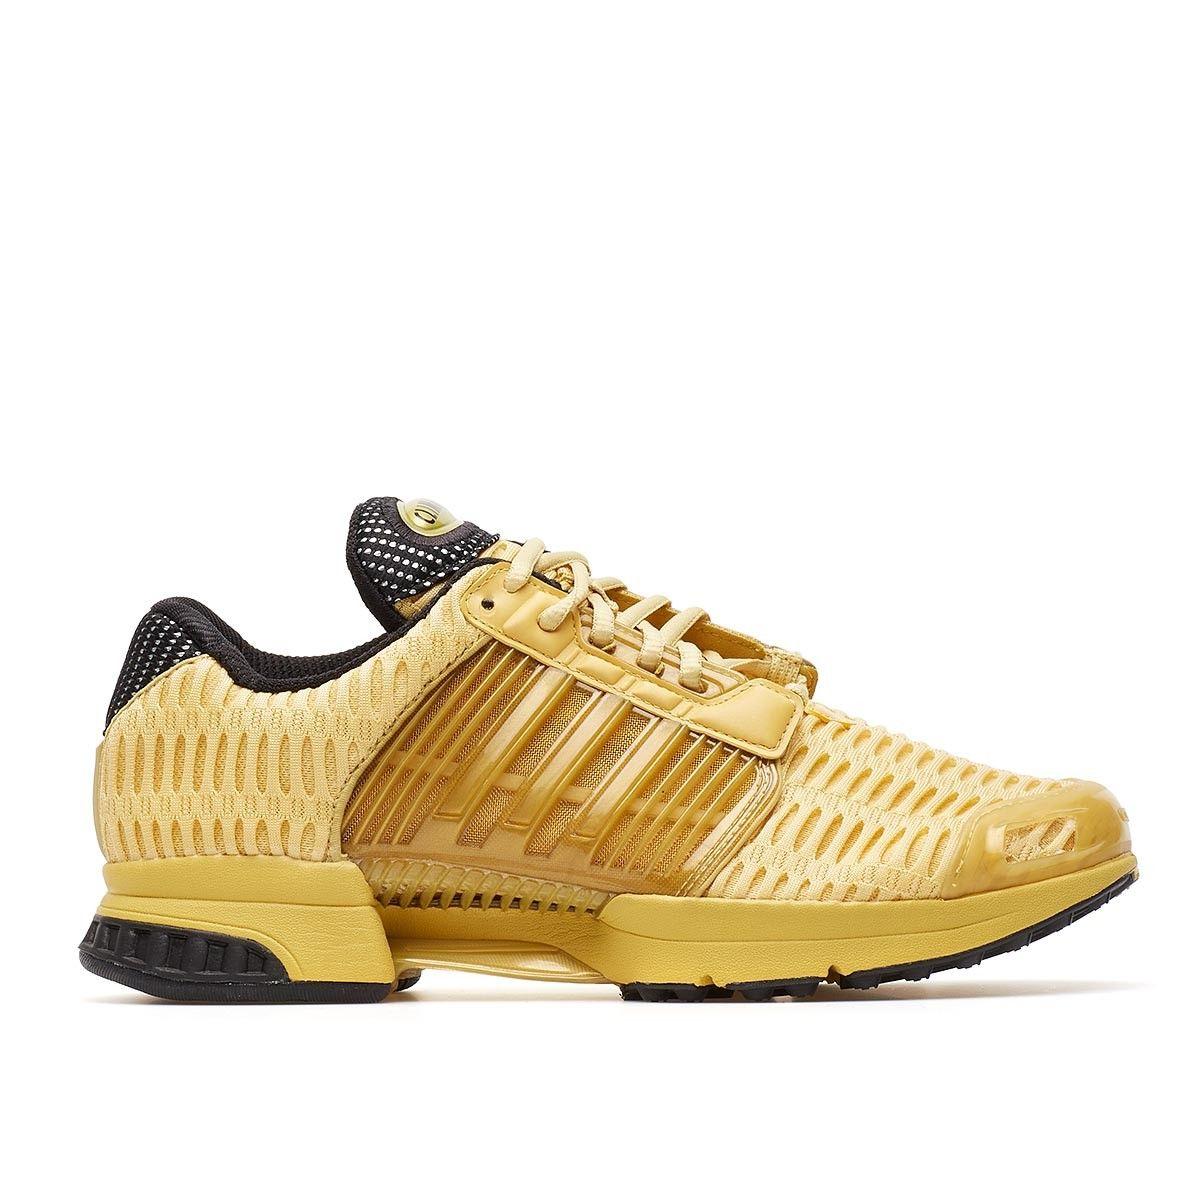 adidas climacool oro